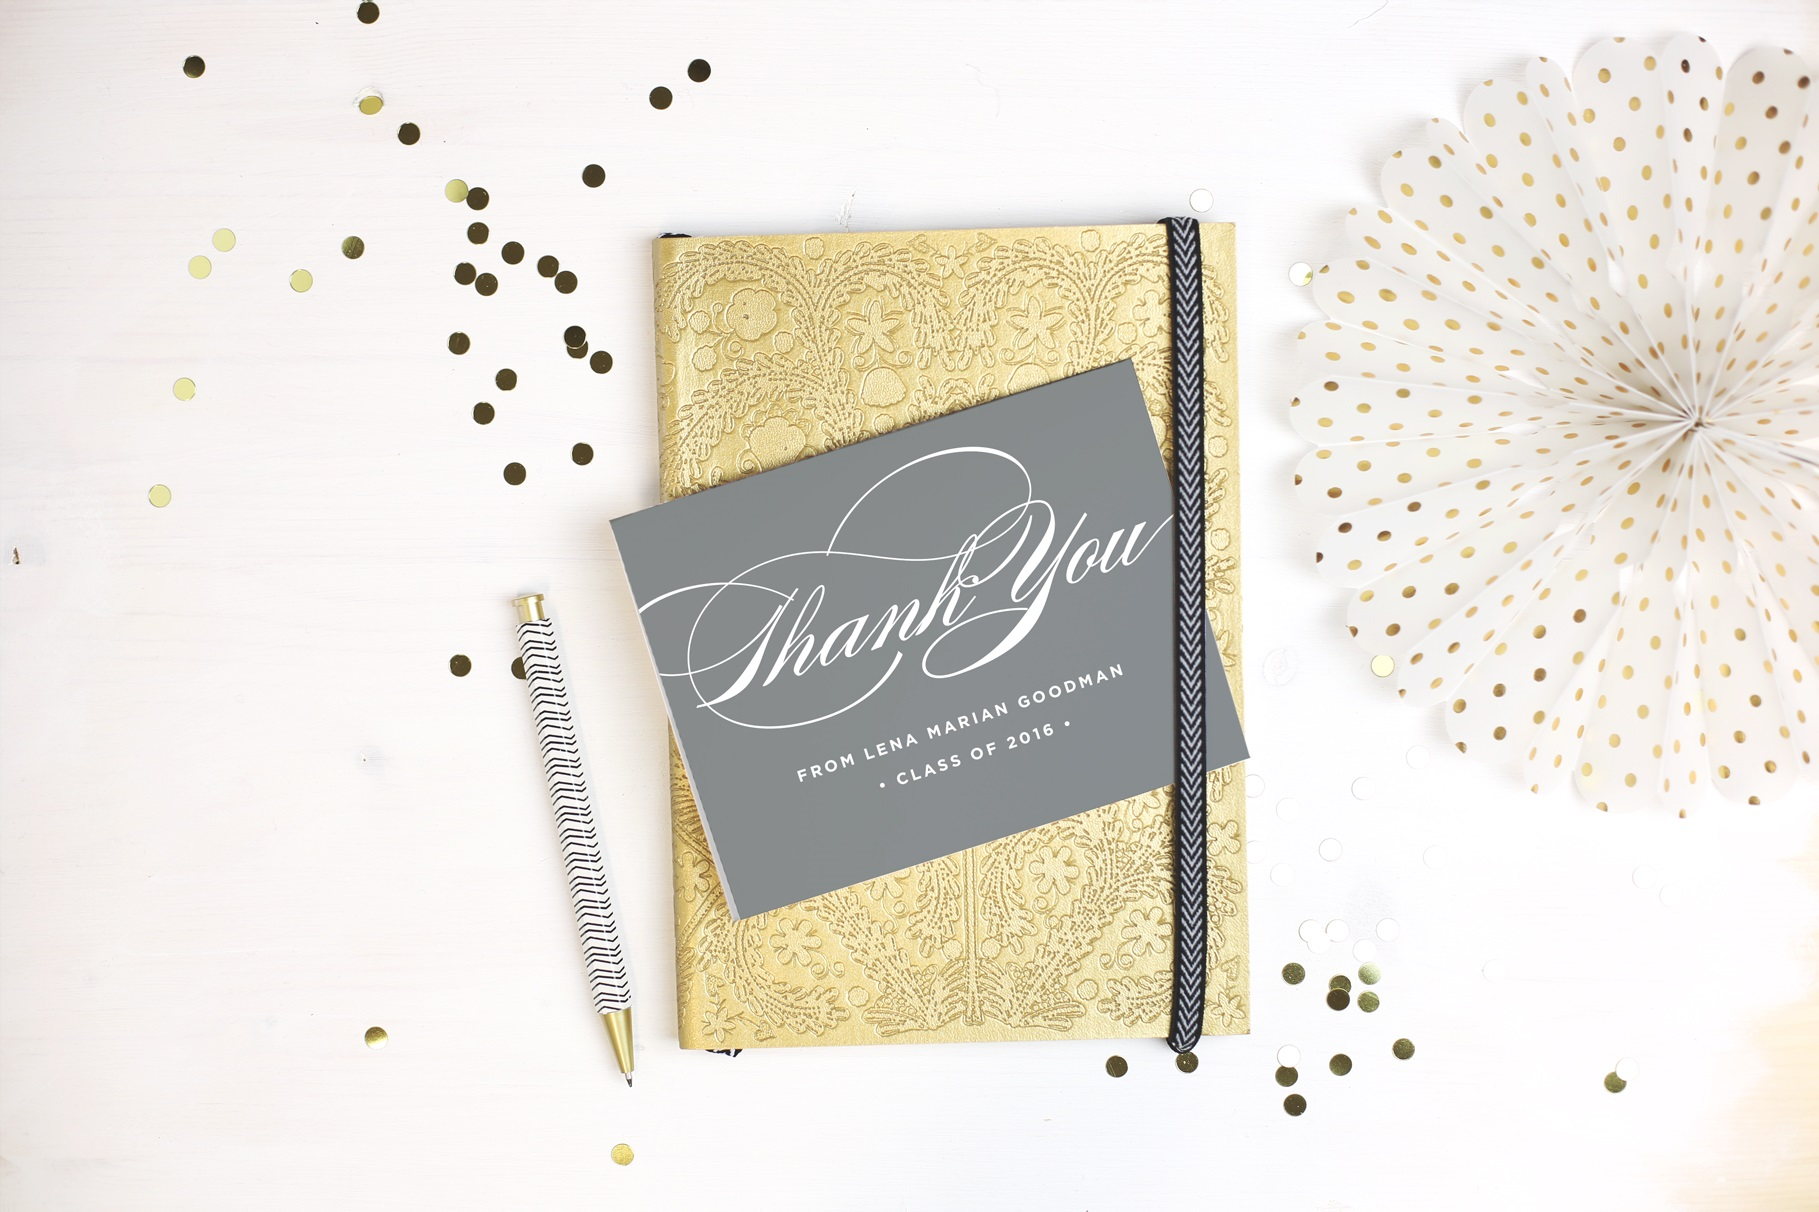 Basic_Invite_Graduation_Invites_and_Announcements_thanks